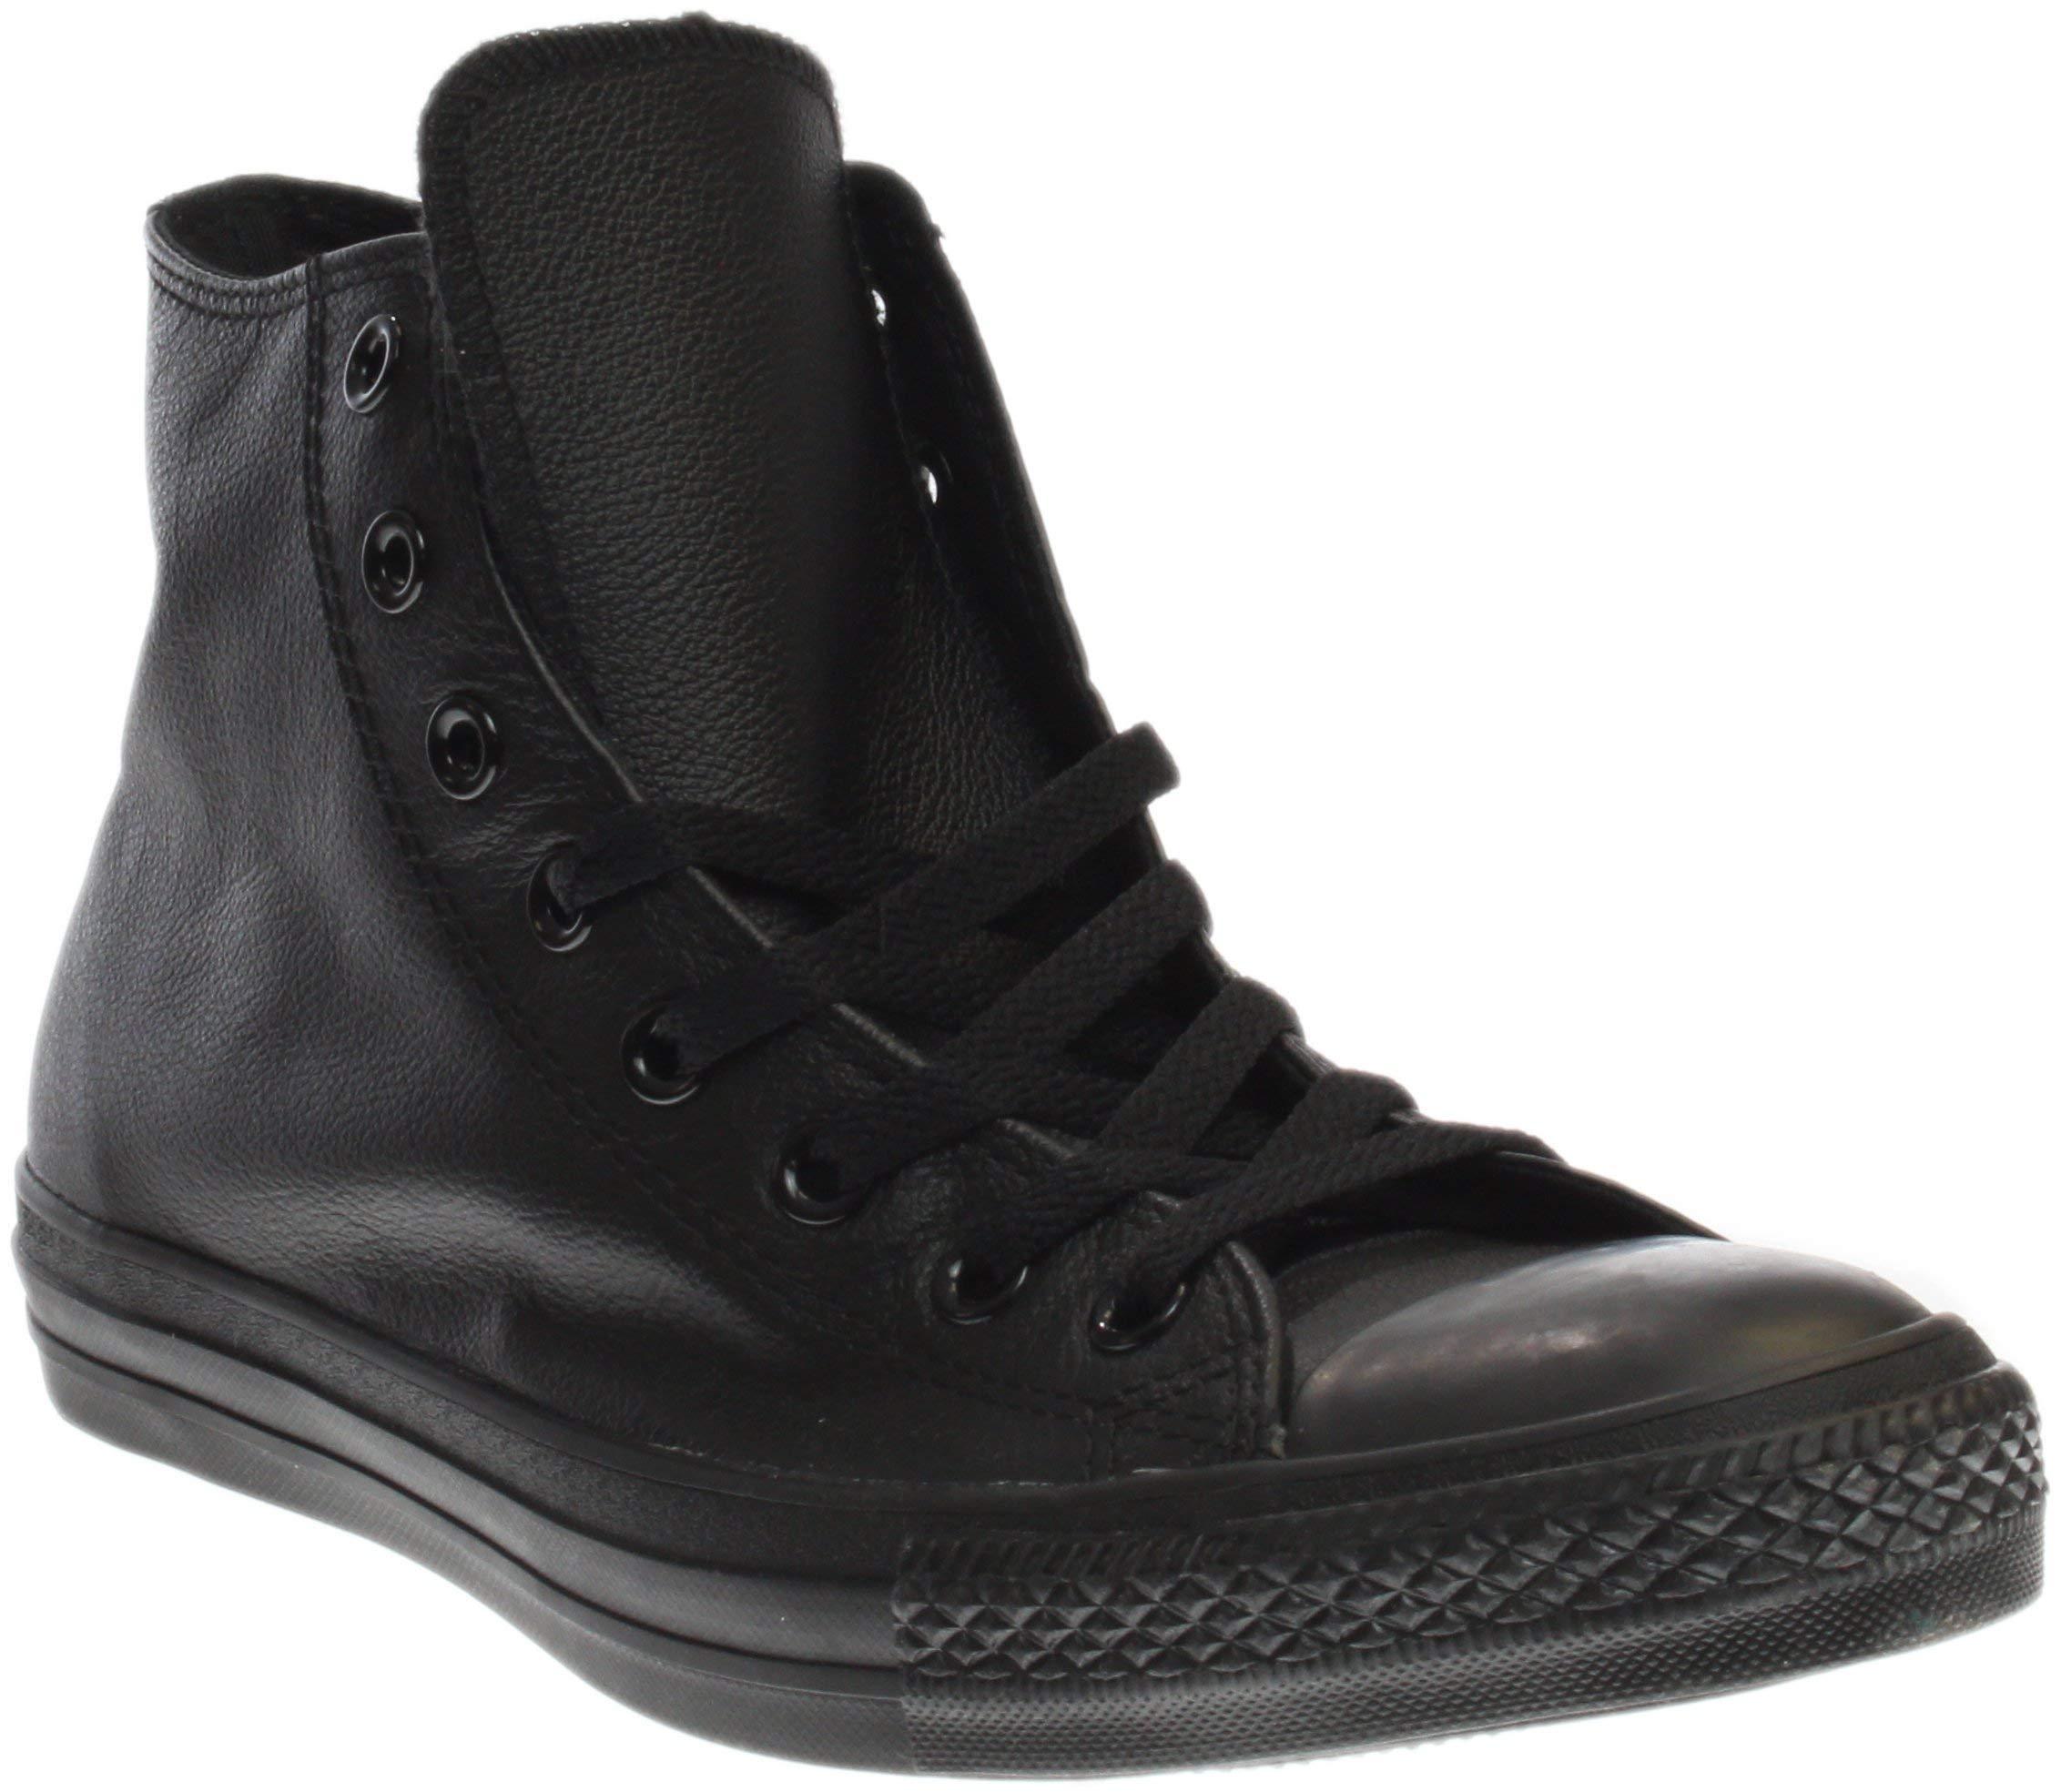 acd81d4a9396 Galleon - Converse Unisex Chuck Taylor All Star Hi Top Sneaker (5.5 B(M) US  Women   3.5 D(M) US Men